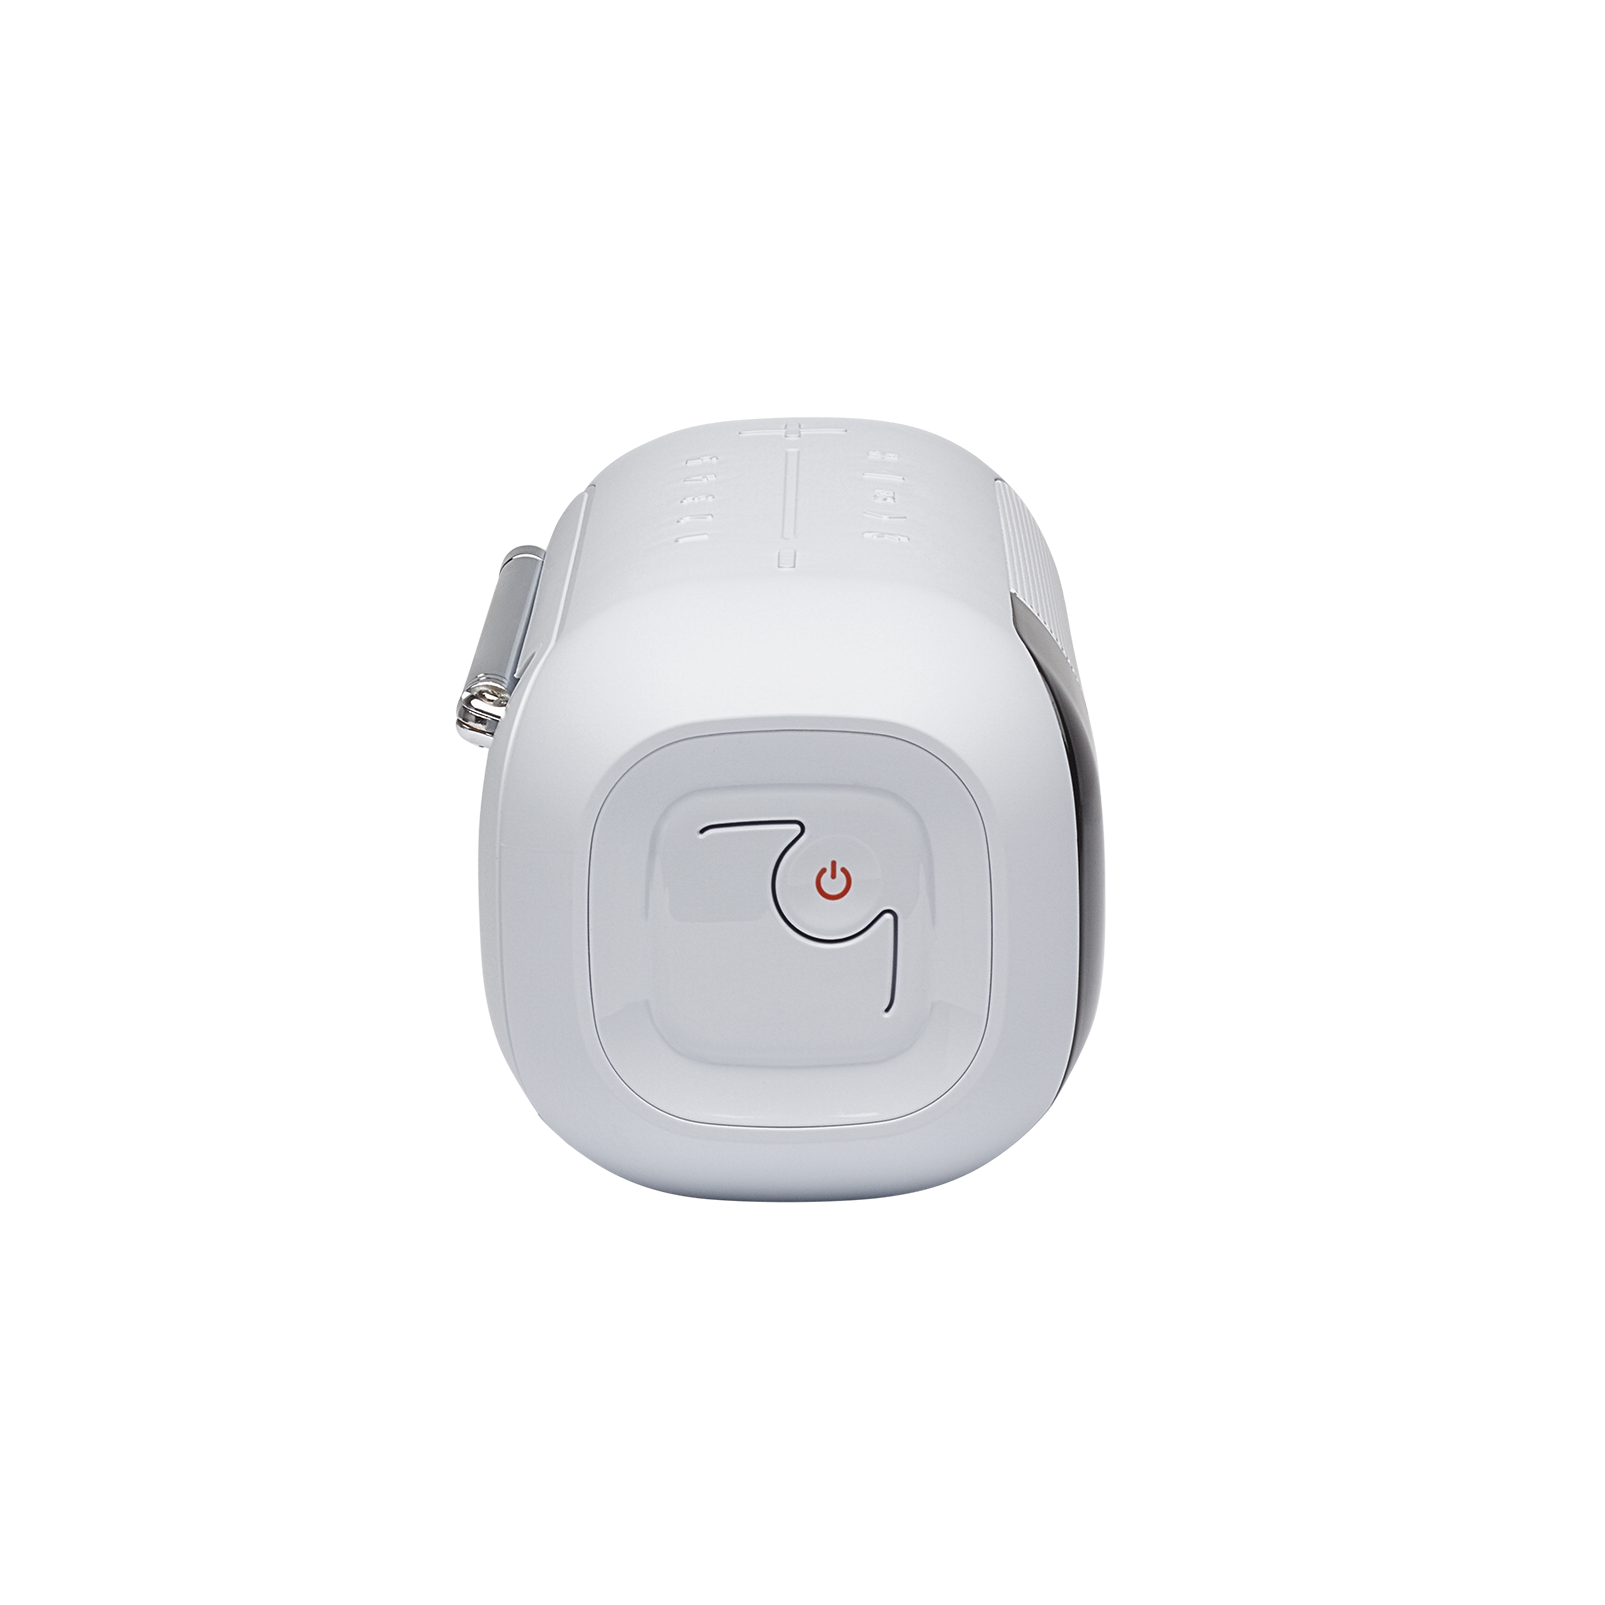 JBL Tuner 2 - White - Portable DAB/DAB+/FM radio with Bluetooth - Right